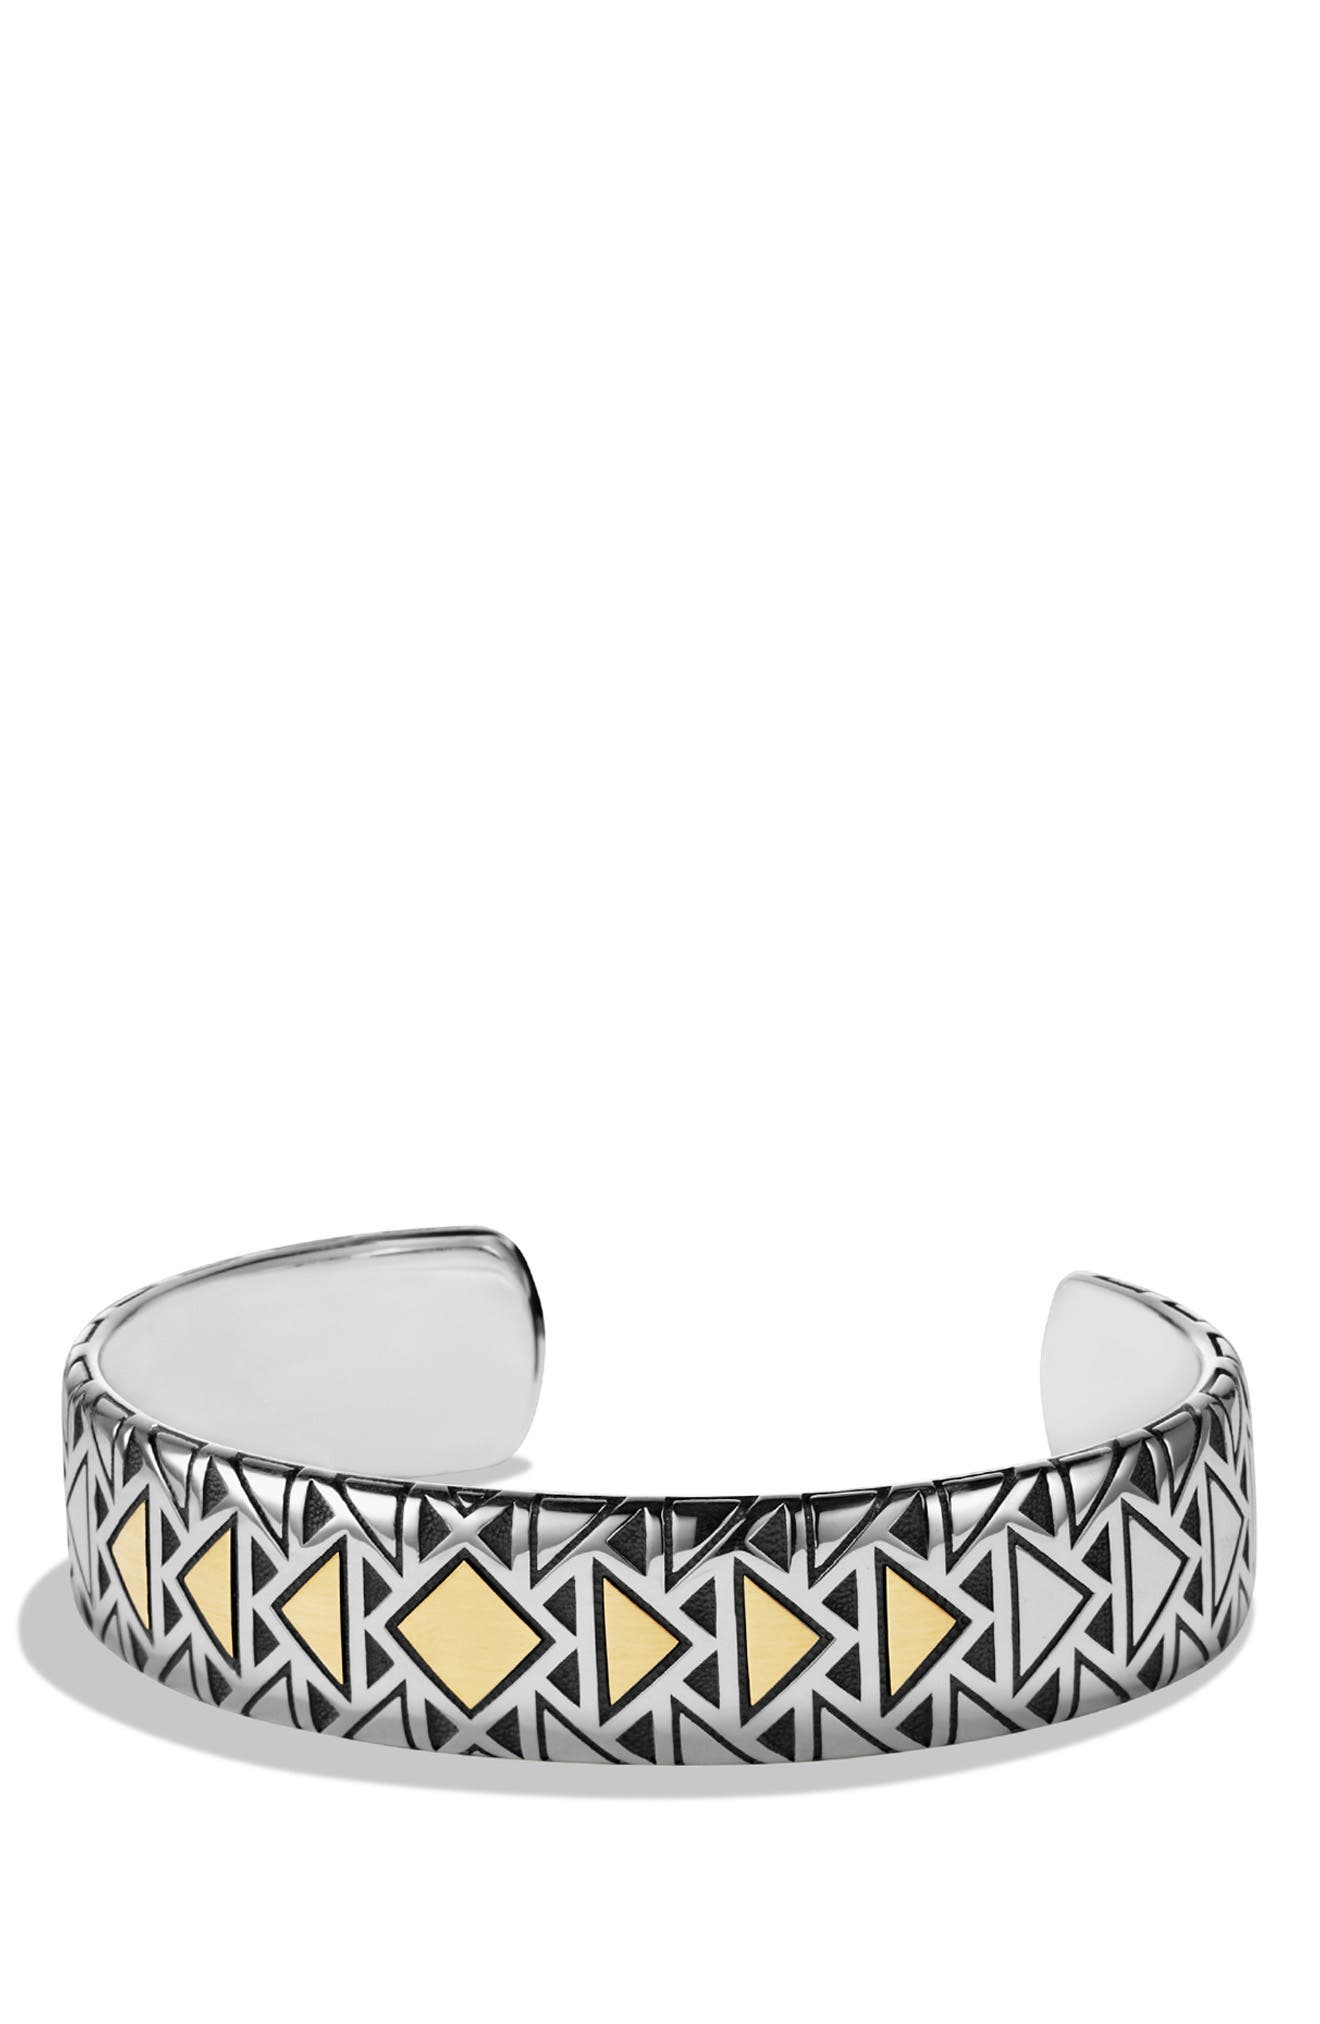 DAVID YURMAN,                             Southwest Cuff Bracelet with 18K Gold,                             Alternate thumbnail 4, color,                             040